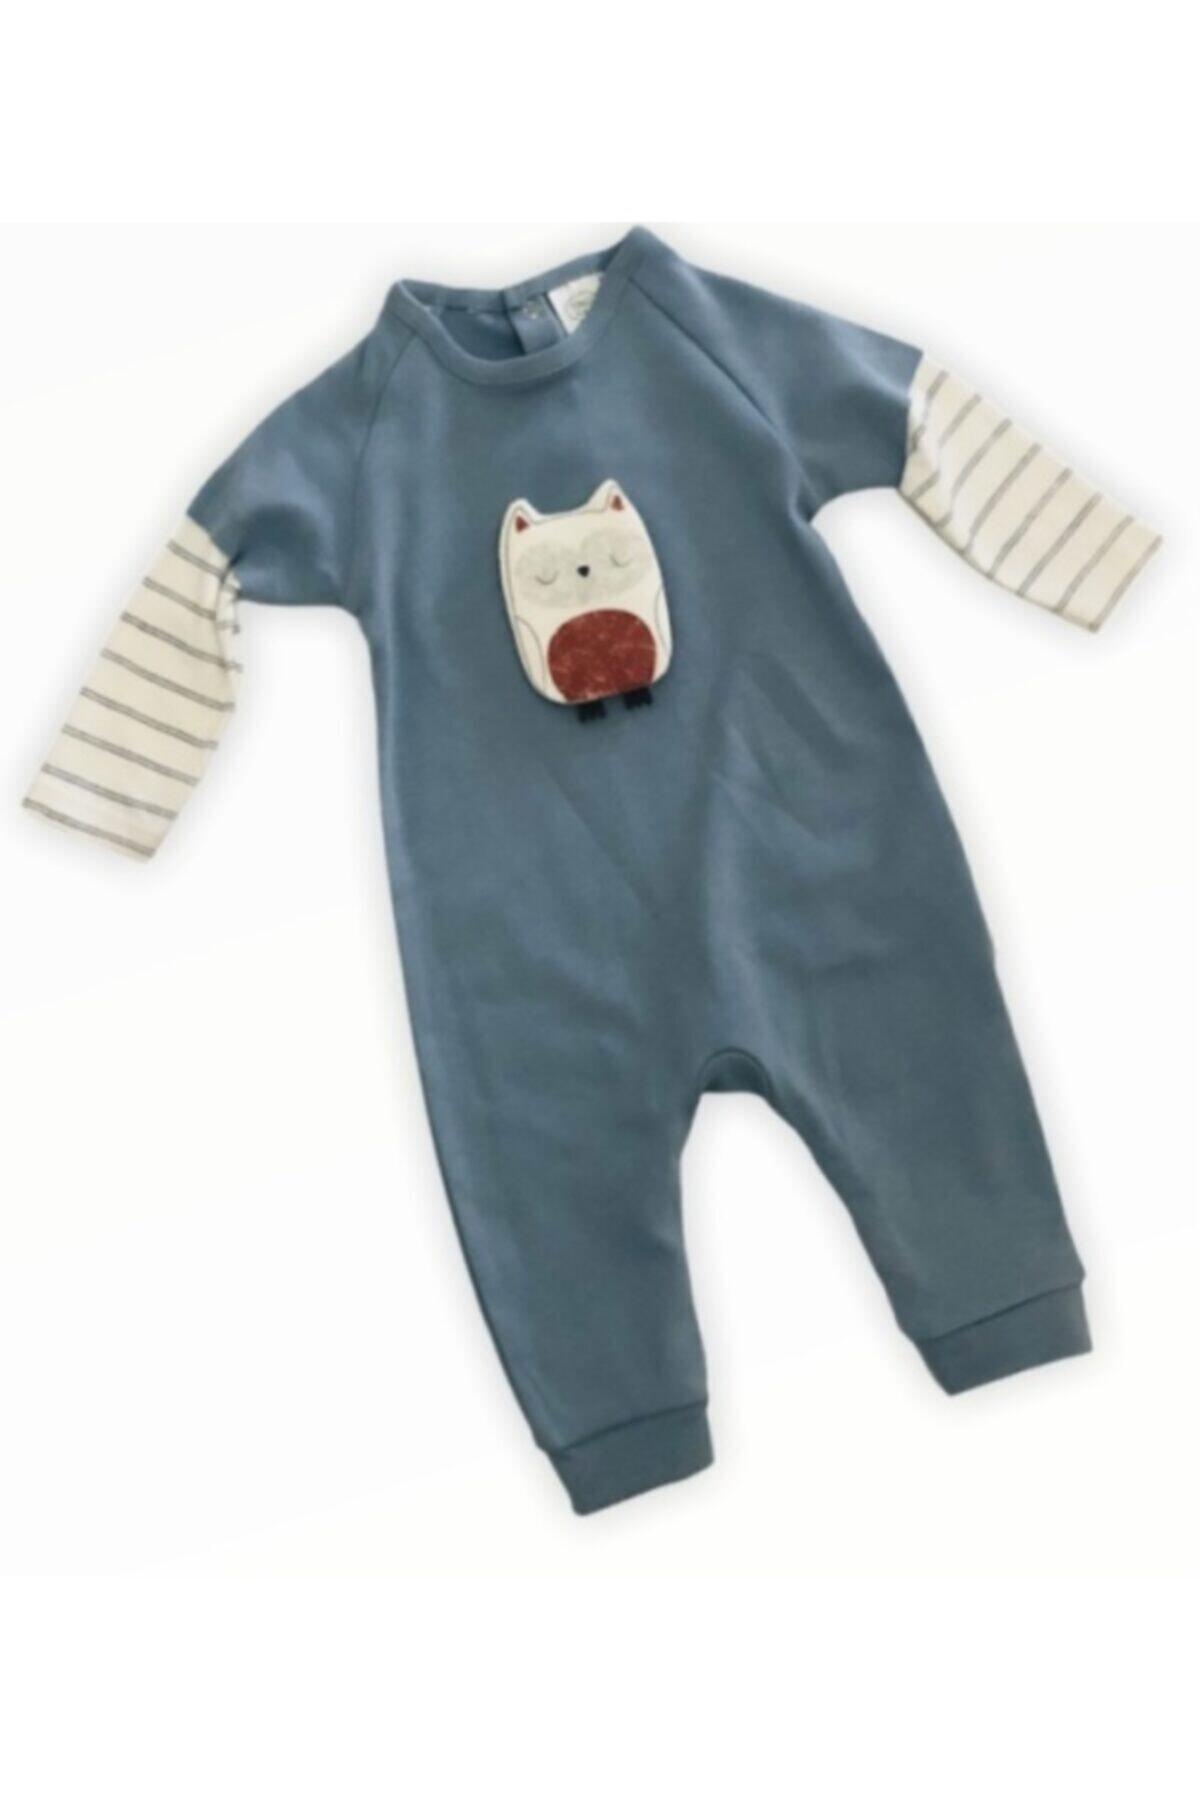 Tongs Baby Unisex Bebek Mavi Baykuşlu Tulum 1